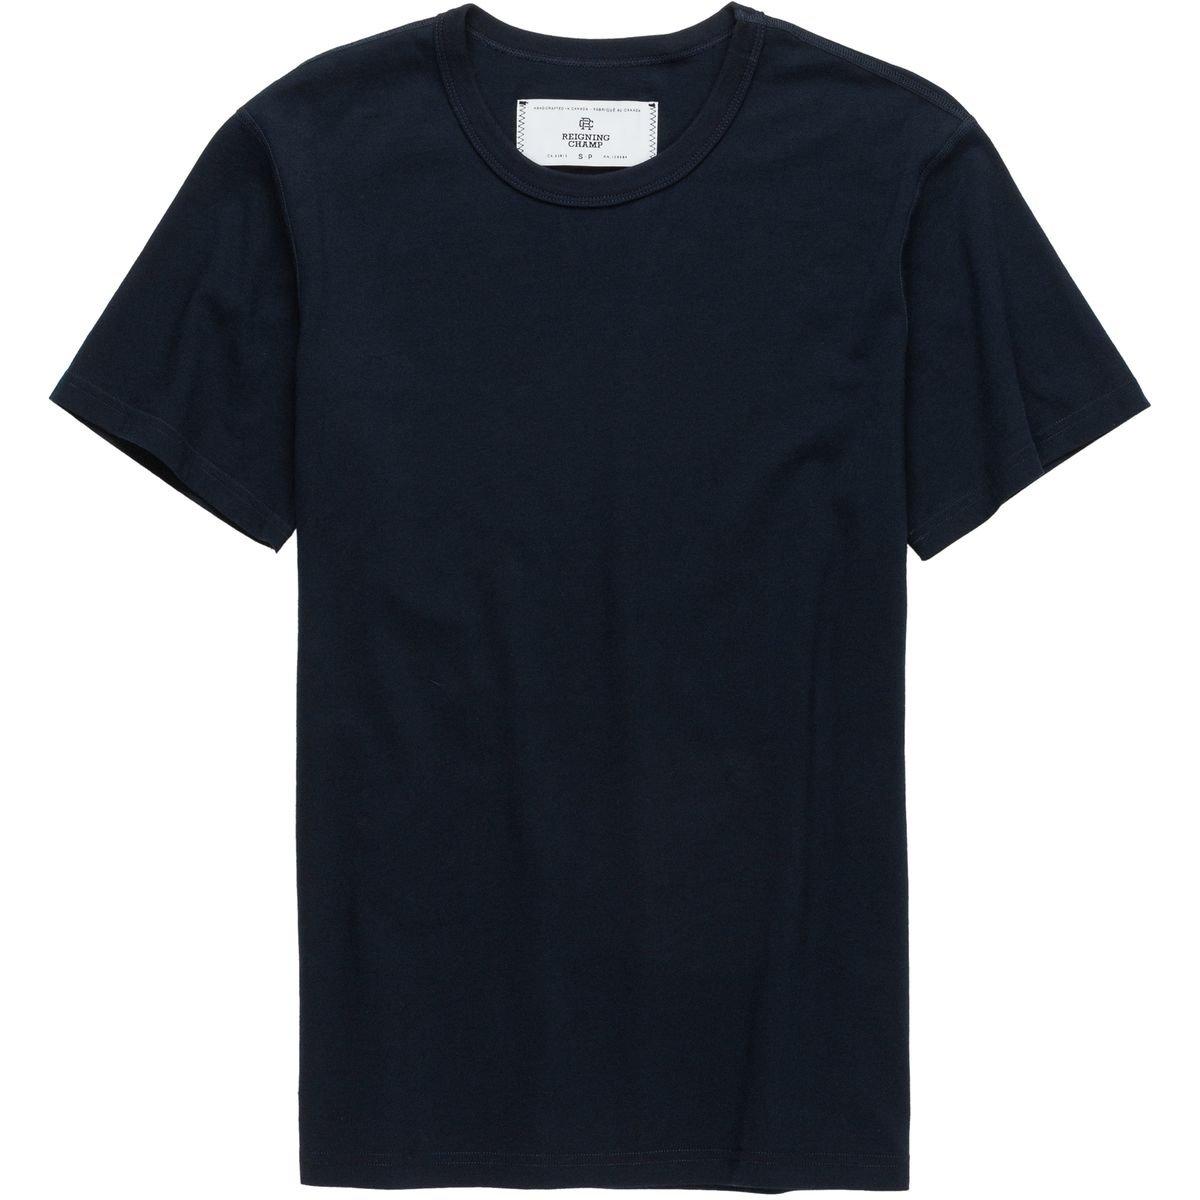 7d873681db Reigning Champ Crewneck Short-Sleeve T-Shirt - Men s